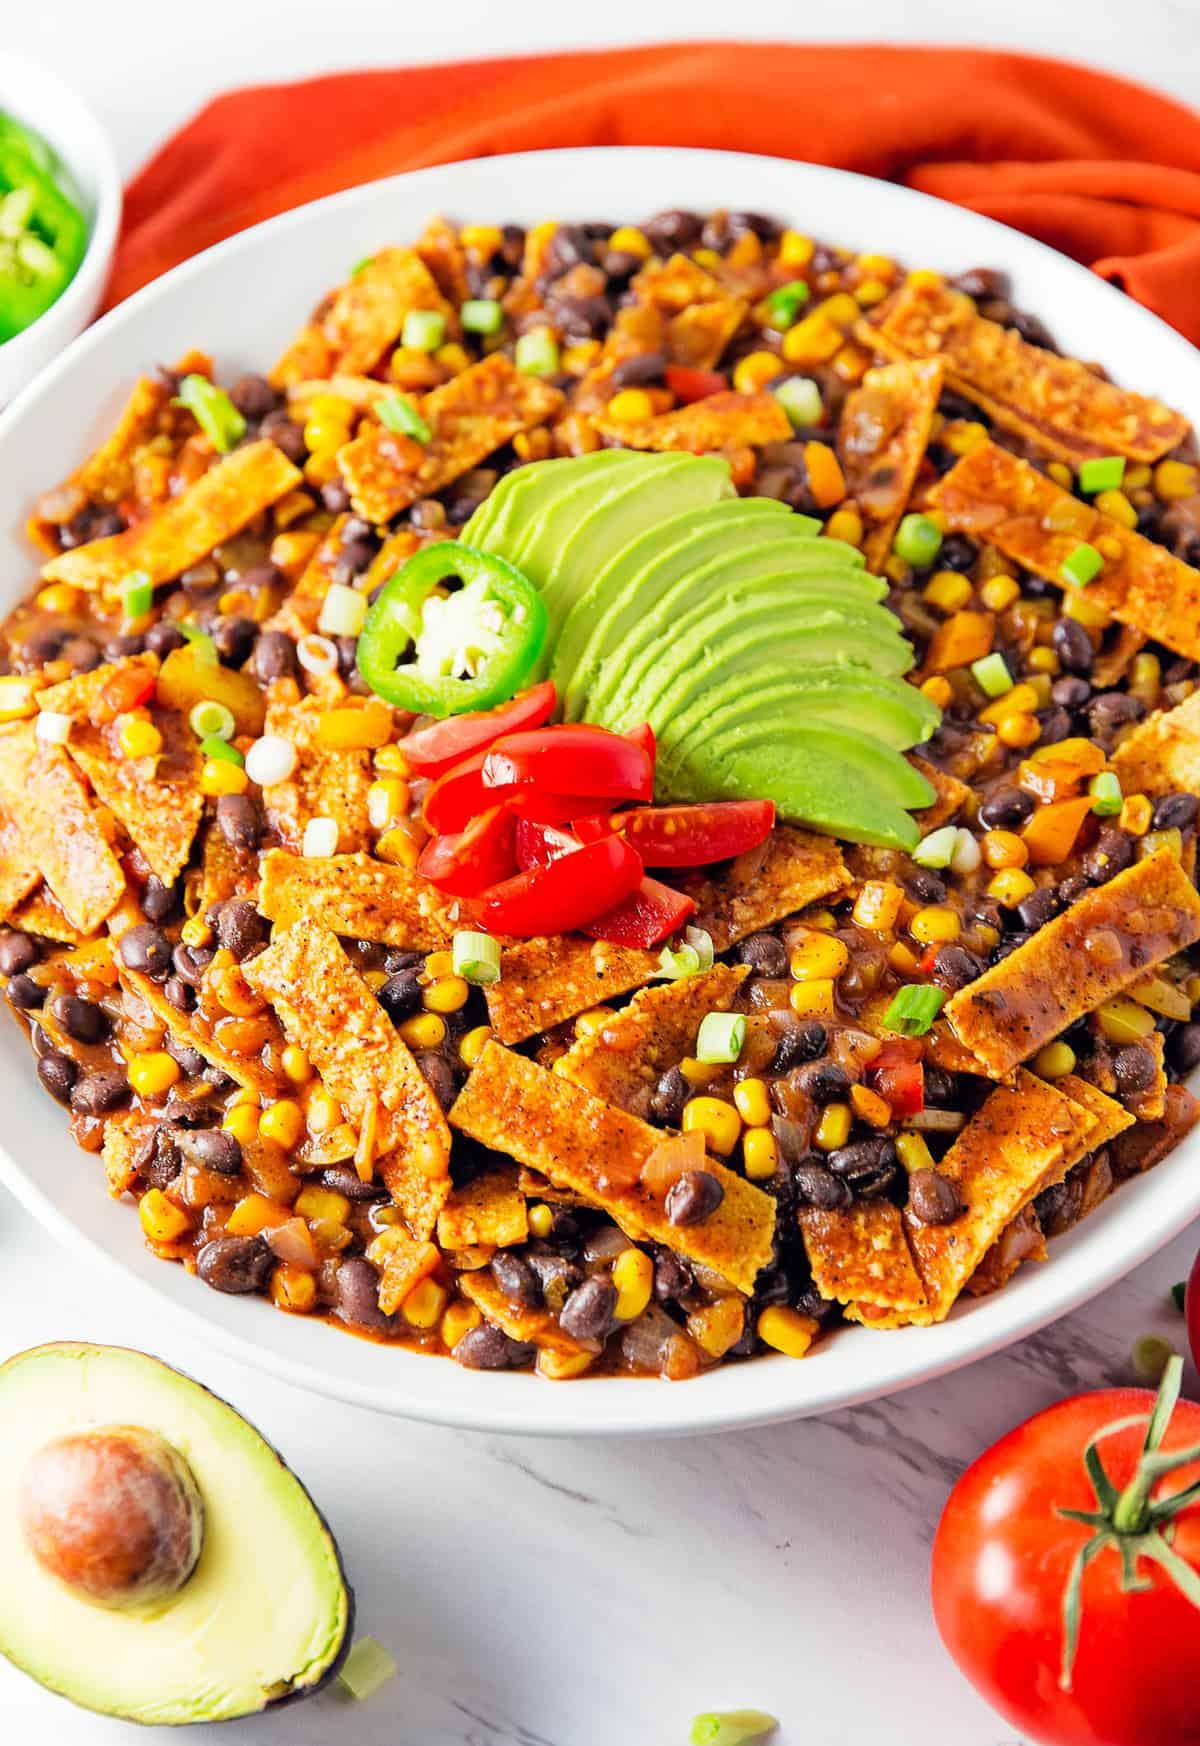 enchilada skillet, enchiladas, vegan, vegetarian, whole food plant based, gluten free, recipe, wfpb, healthy, oil free, no refined sugar, no oil, refined sugar free, lunch, dinner, easy, fast, quick, dairy free, no dairy, Mexican, Southwestern